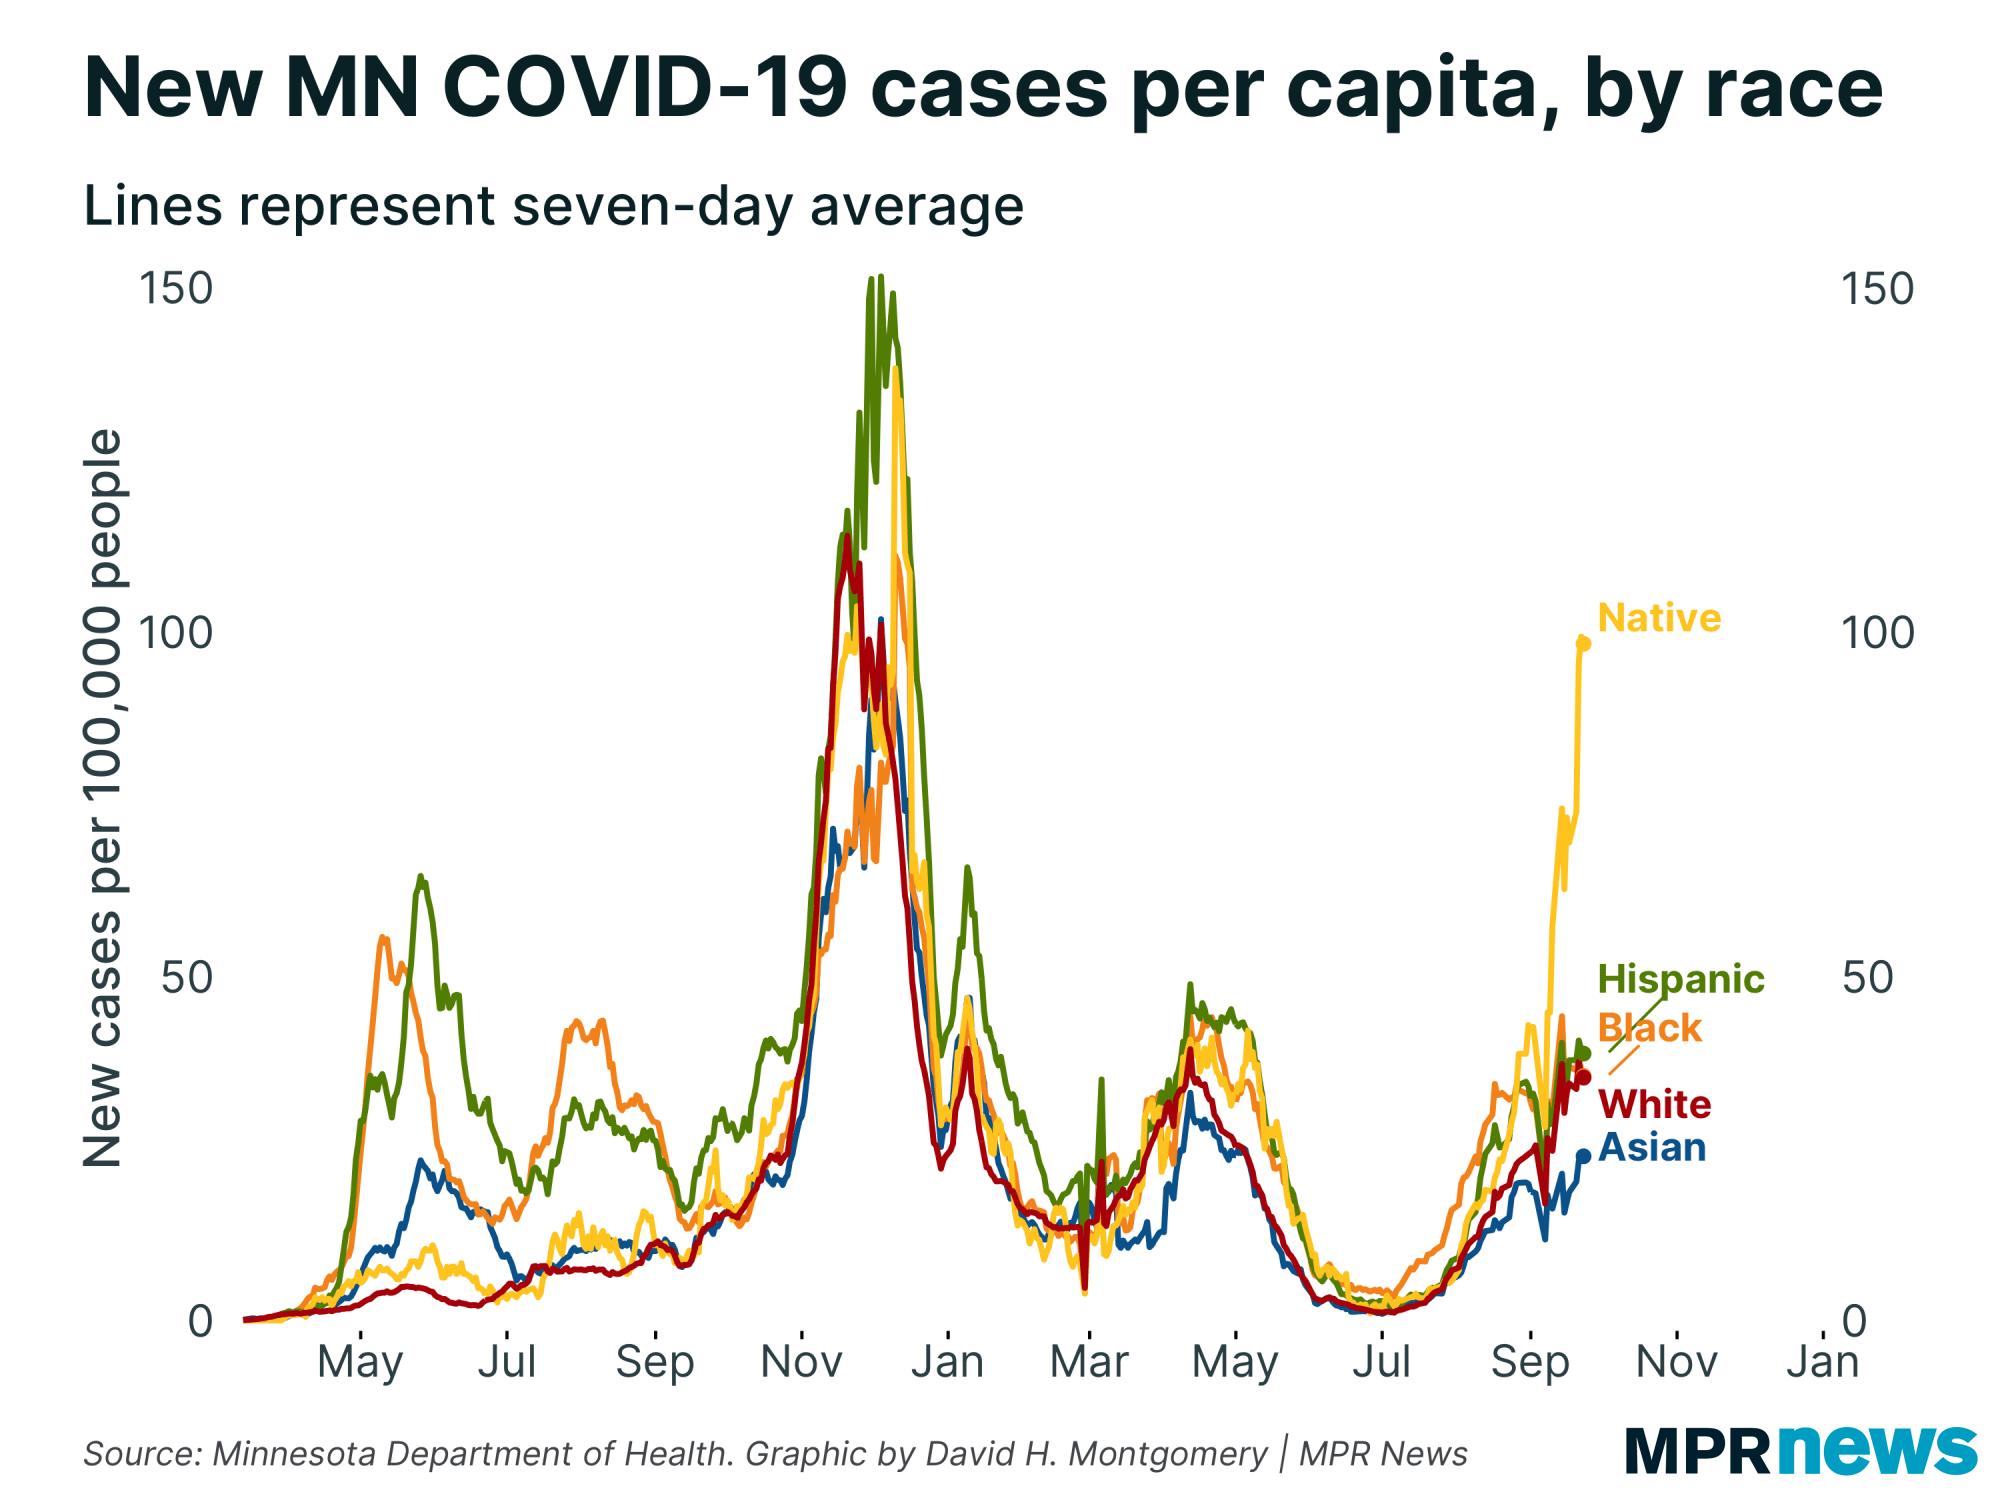 New COVID-19 cases per capita by race